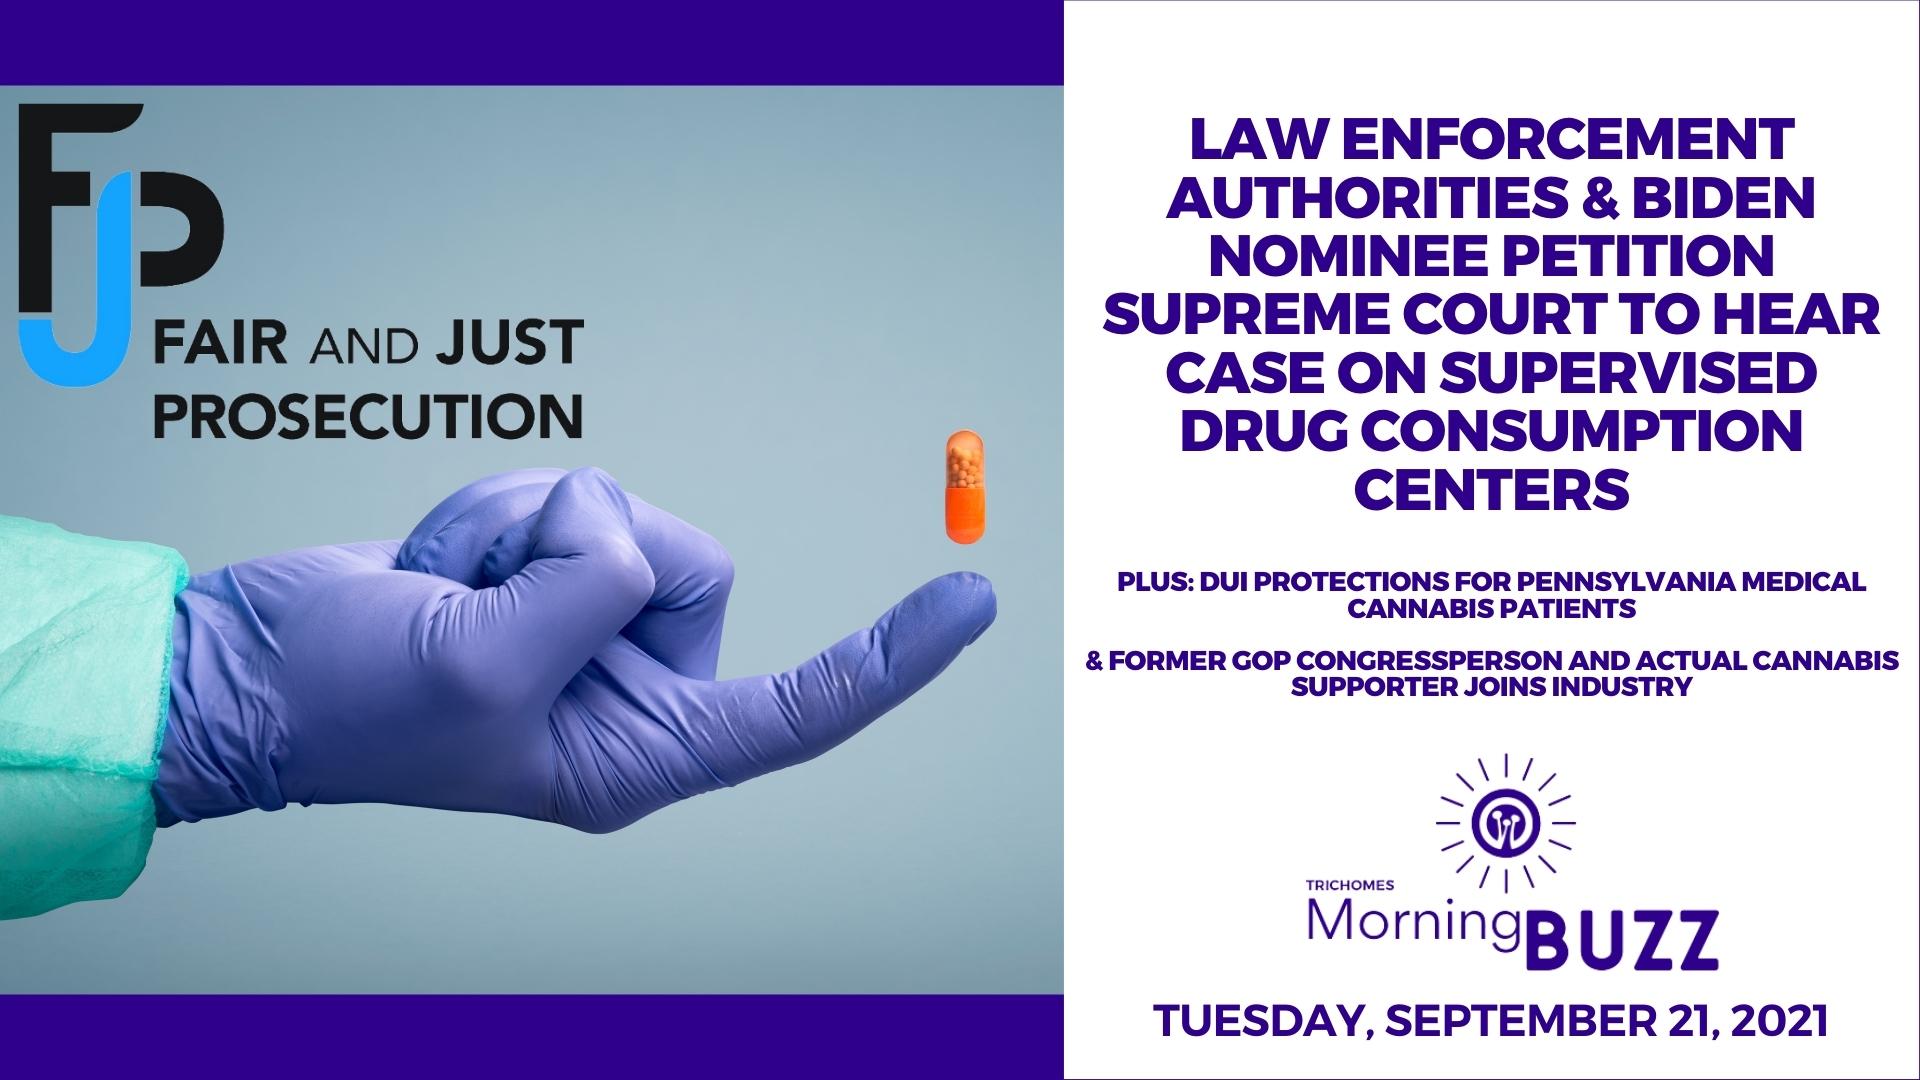 Law Enforcement Authorities & Biden Nominee Petition Supreme Court To Hear Case On Supervised Drug Consumption Centers show art